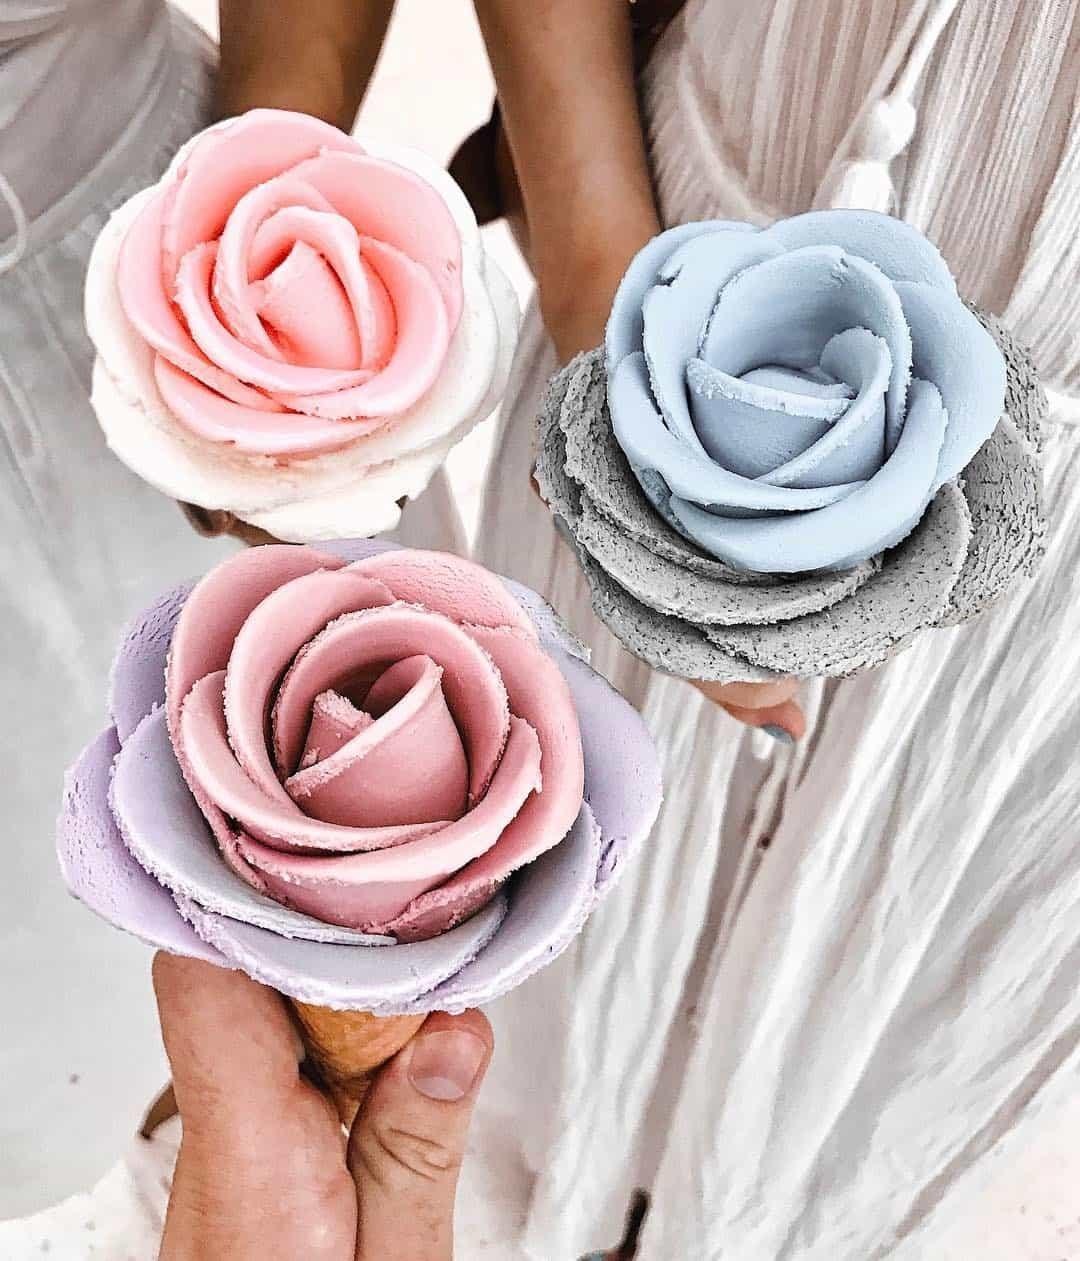 Ide Hidangan Pencuci Mulut Cantik untuk Pernikahan